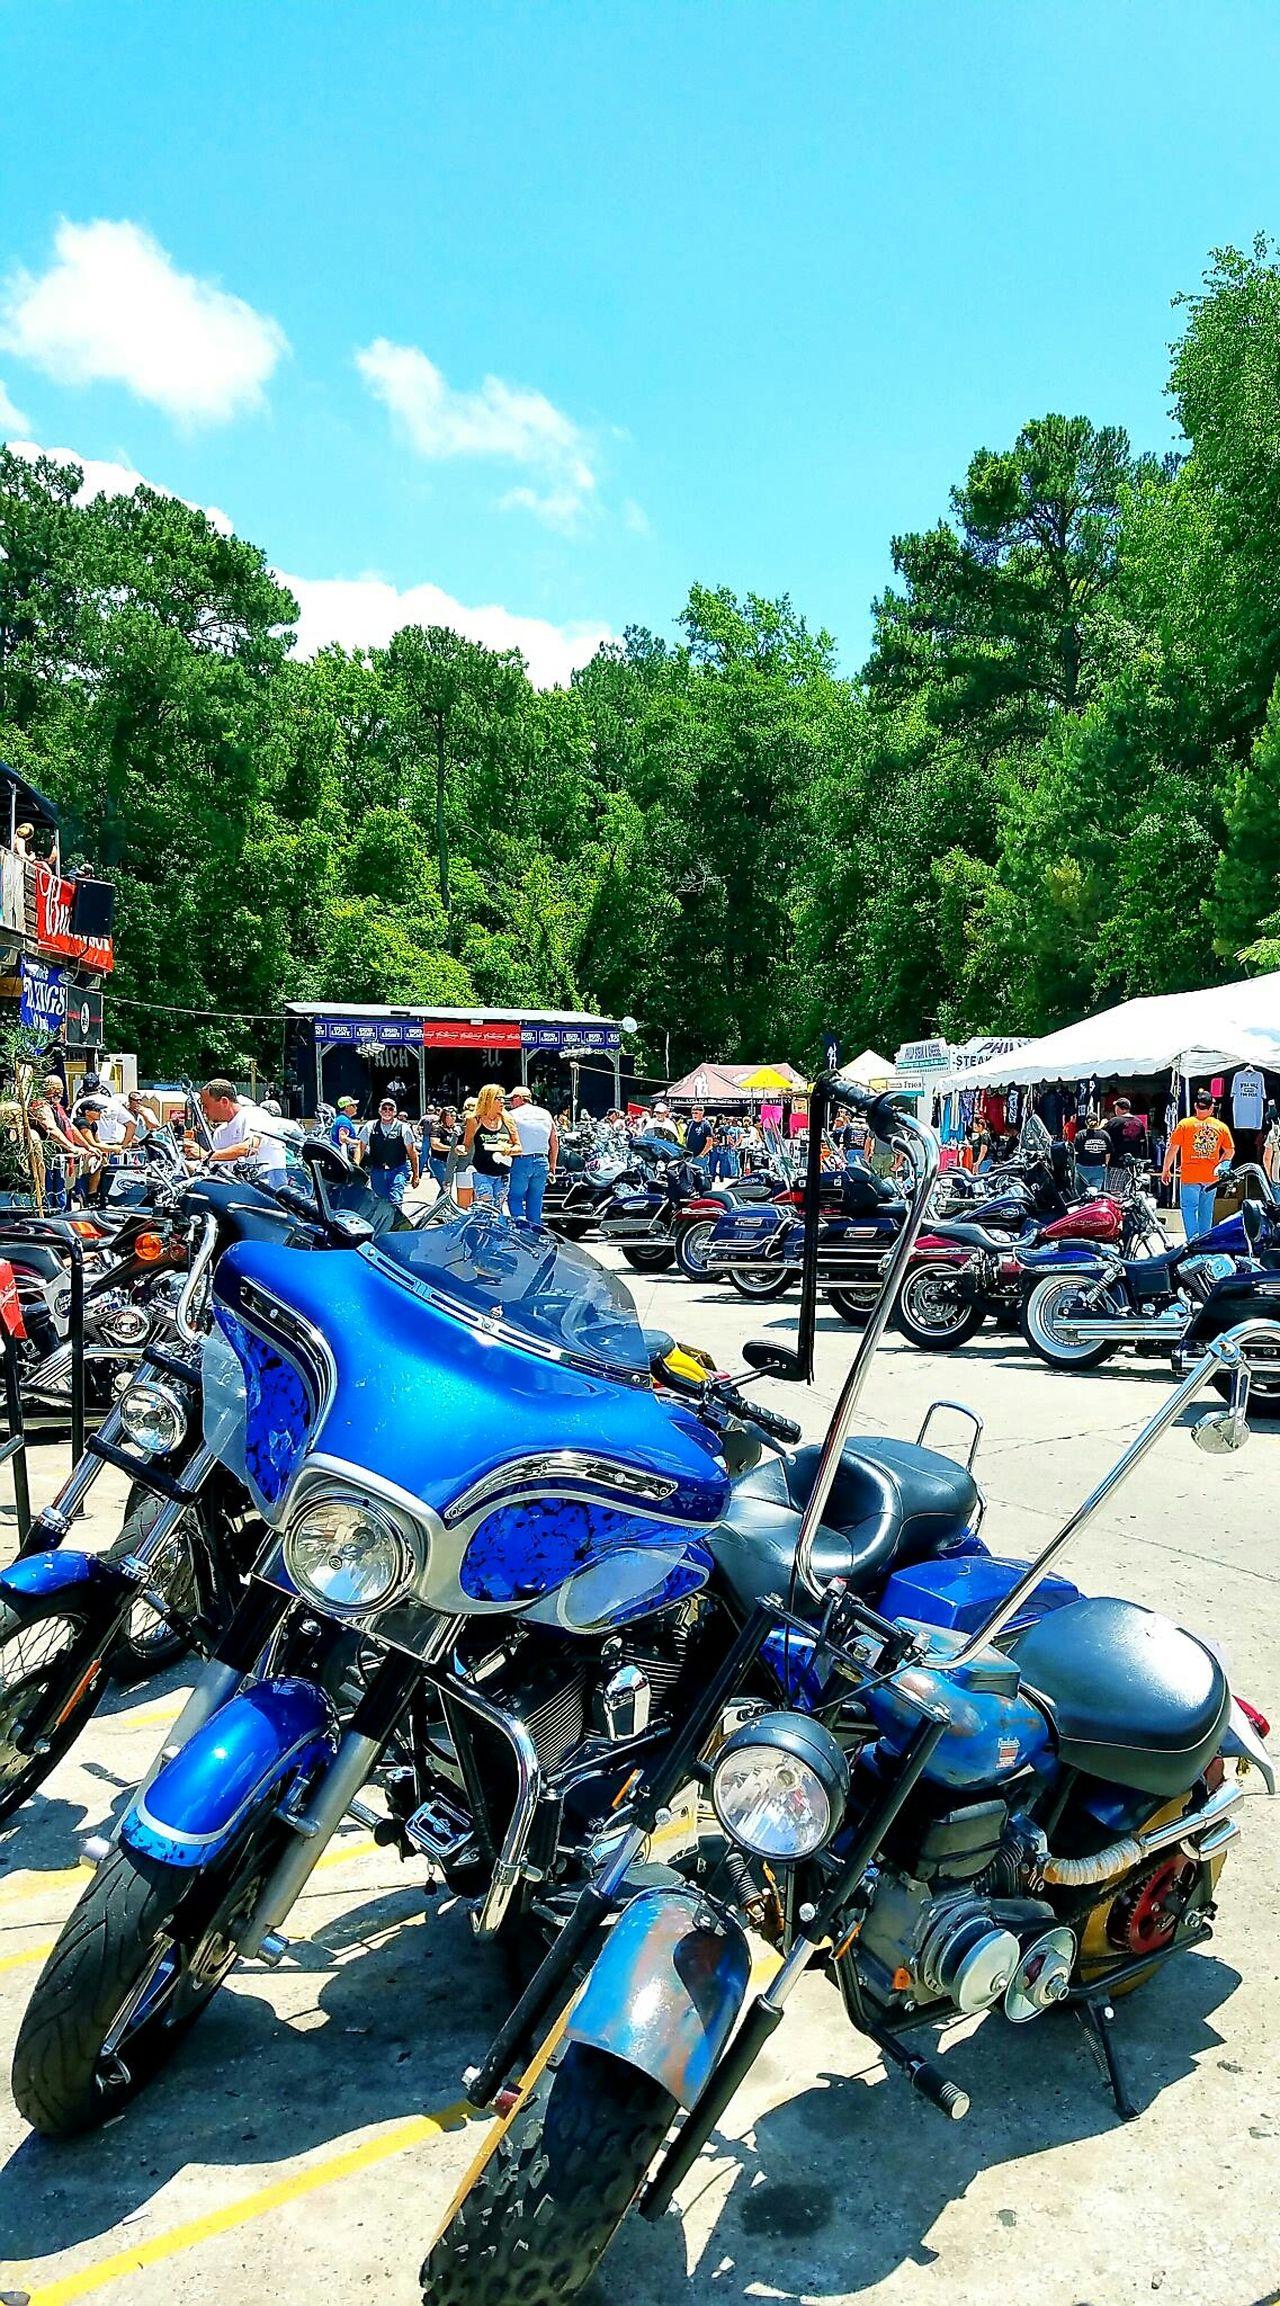 Tree Blue Celebration Outdoors Multi Colored Day Bikeweek2016 Bikeweek Harleydavidsongirl Harleygirl Harley4life Myrtlebeachsouthcarolins Transportation Mode Of Transport